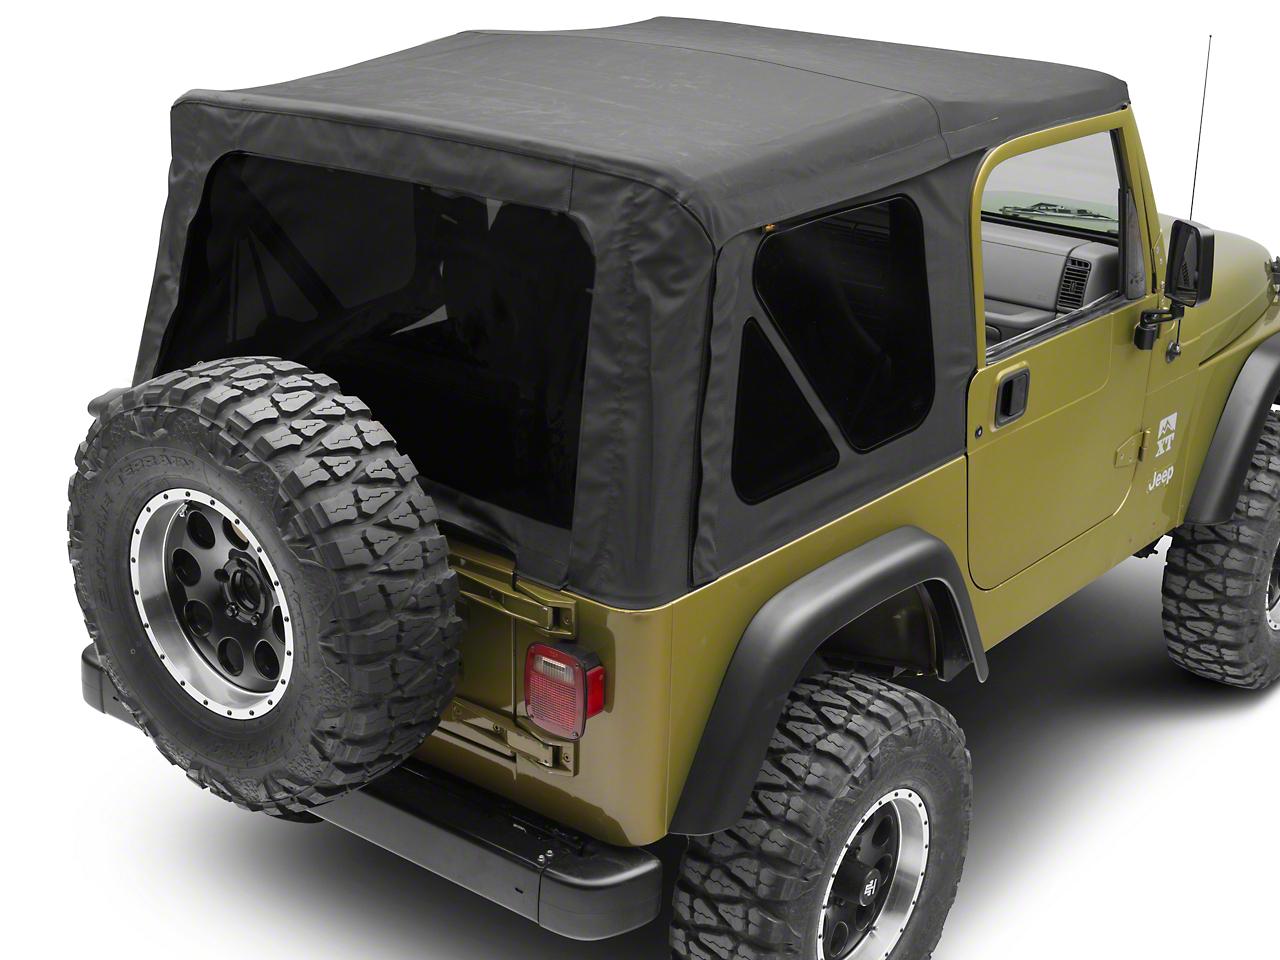 Bestop Supertop NX Soft Top - Black Diamond (97-06 Jeep Wrangler TJ, Excluding Unlimited)